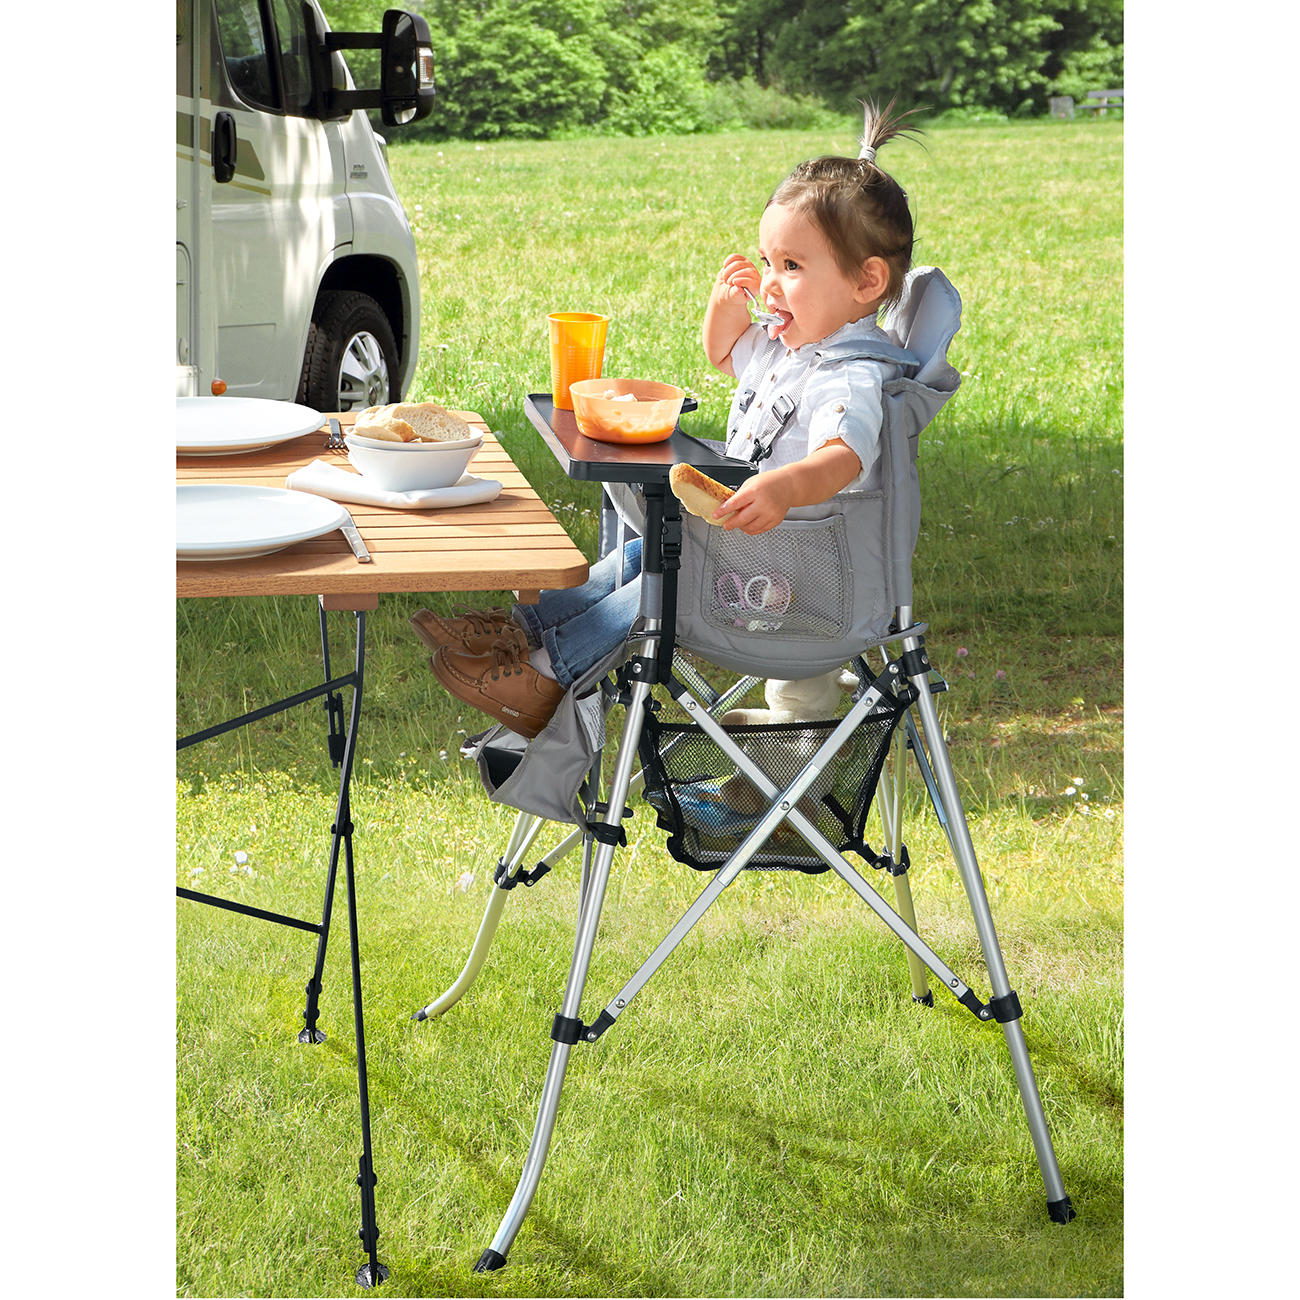 Sensational Foldable High Chair For Children Mit 3 Jahren Garantie Lamtechconsult Wood Chair Design Ideas Lamtechconsultcom